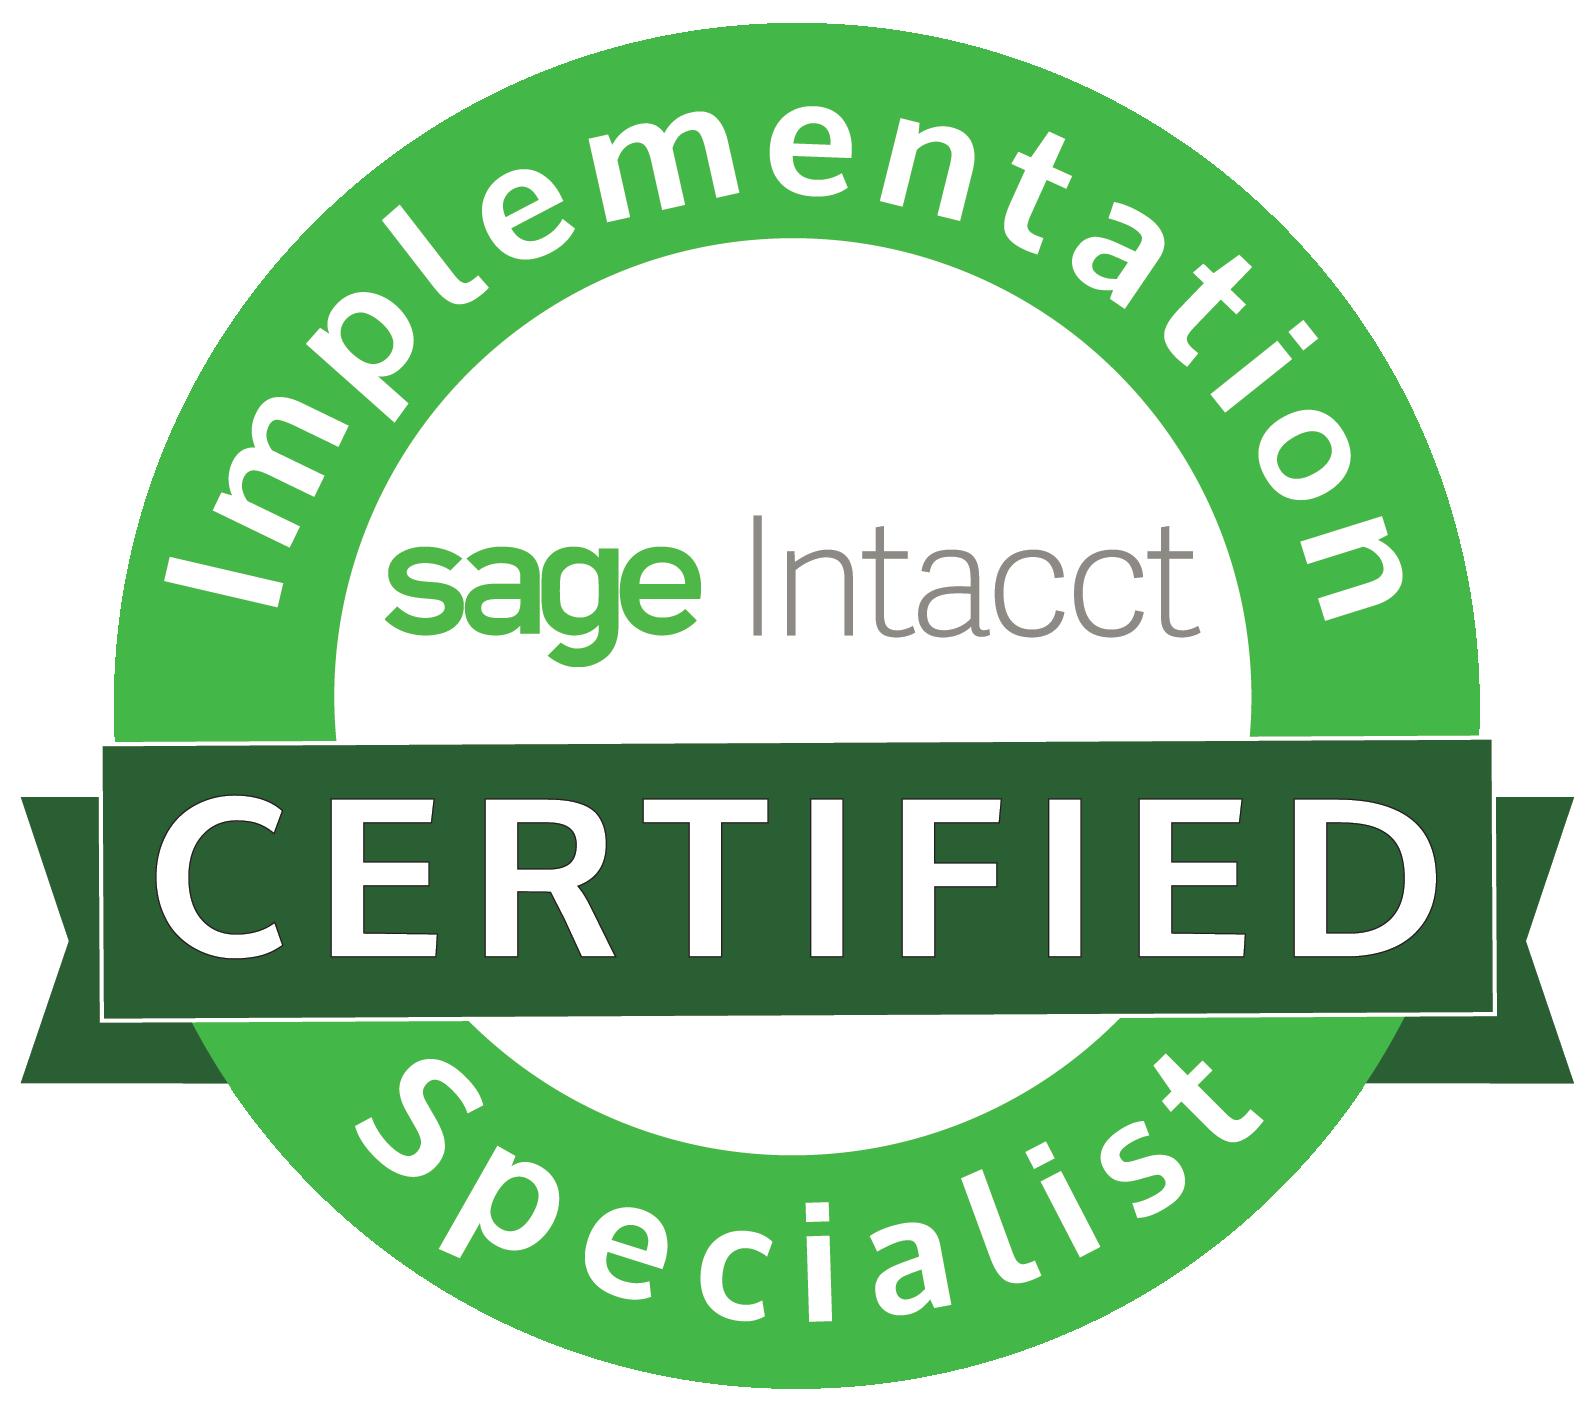 ImplementationSpecialistLogoPNG.png